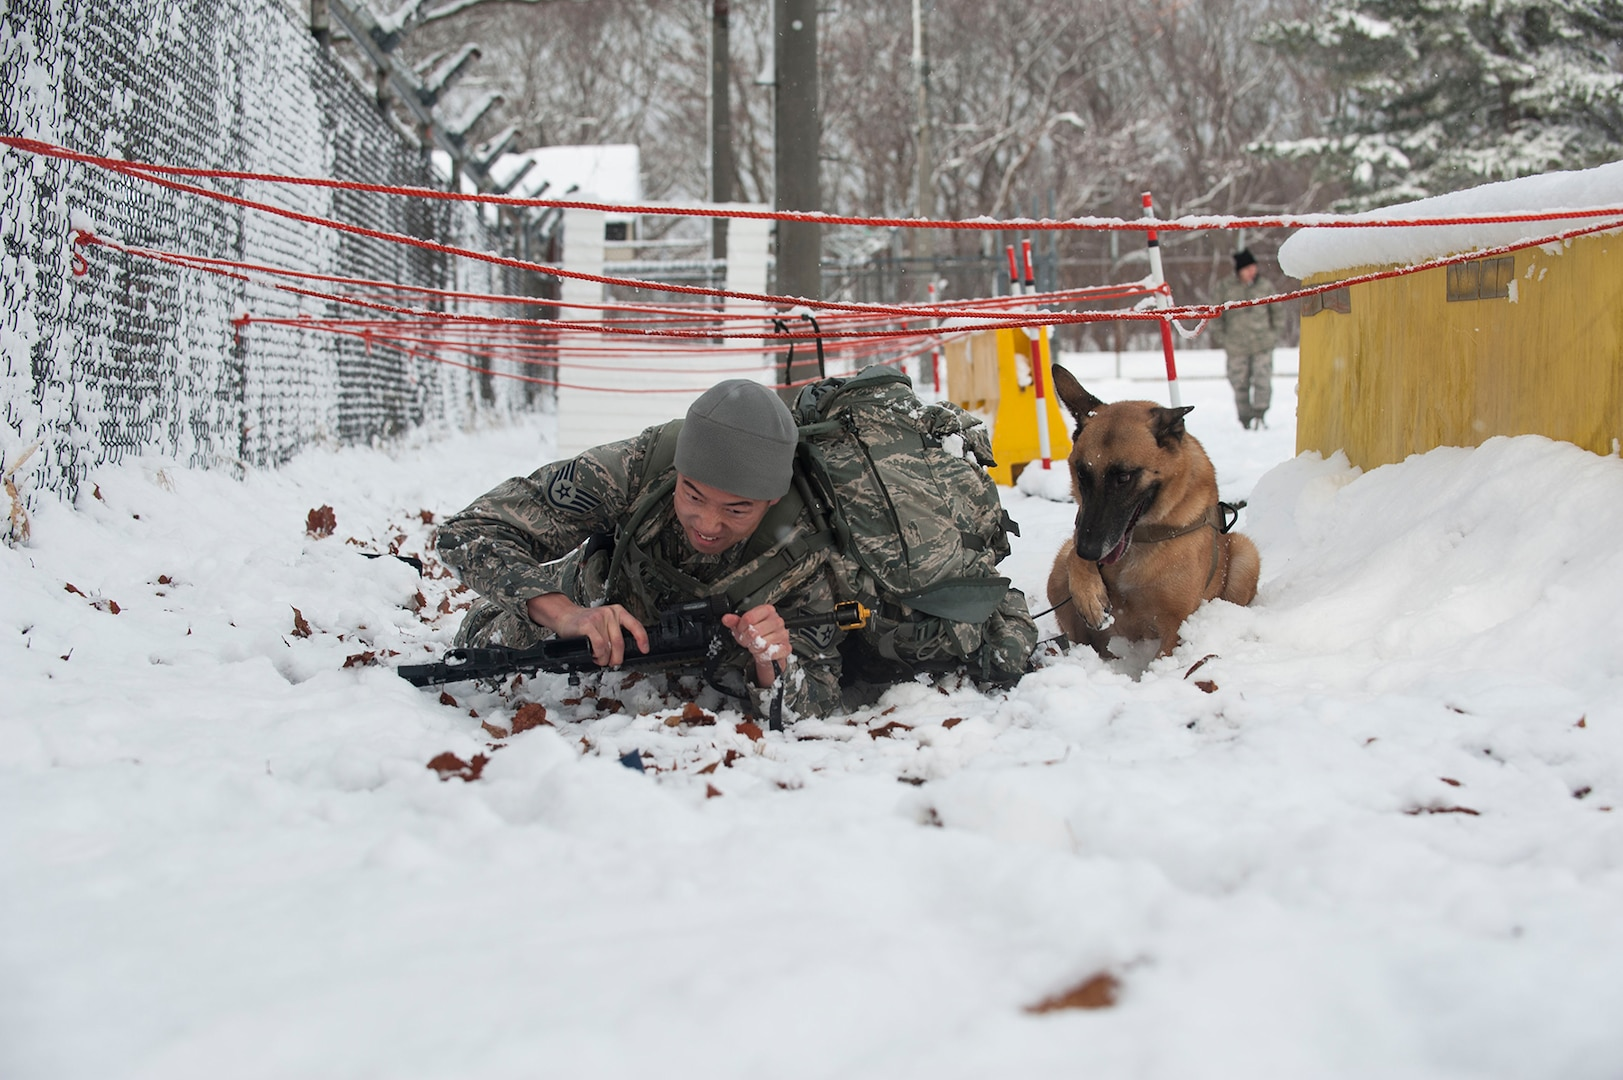 Winter Warrior Challenge tests 35th SFS Airmen's readiness